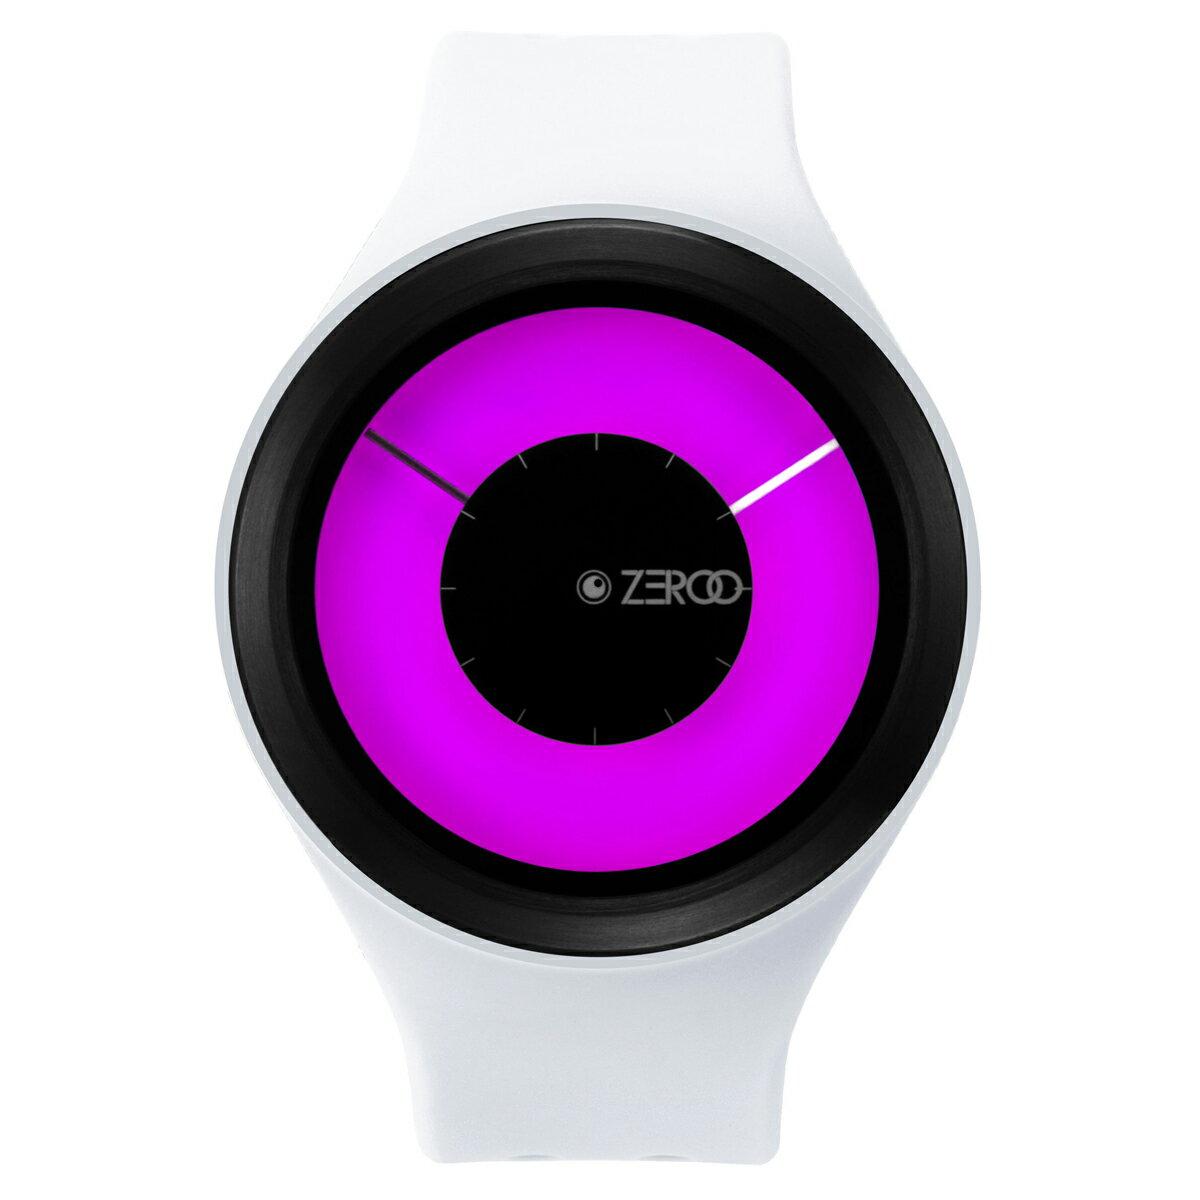 ZEROO MAGIA AURORA ゼロ 電池式クォーツ 腕時計 [W00801B03SR01] ホワイト デザインウォッチ ペア用 メンズ レディース ユニセックス おしゃれ時計 デザイナーズ